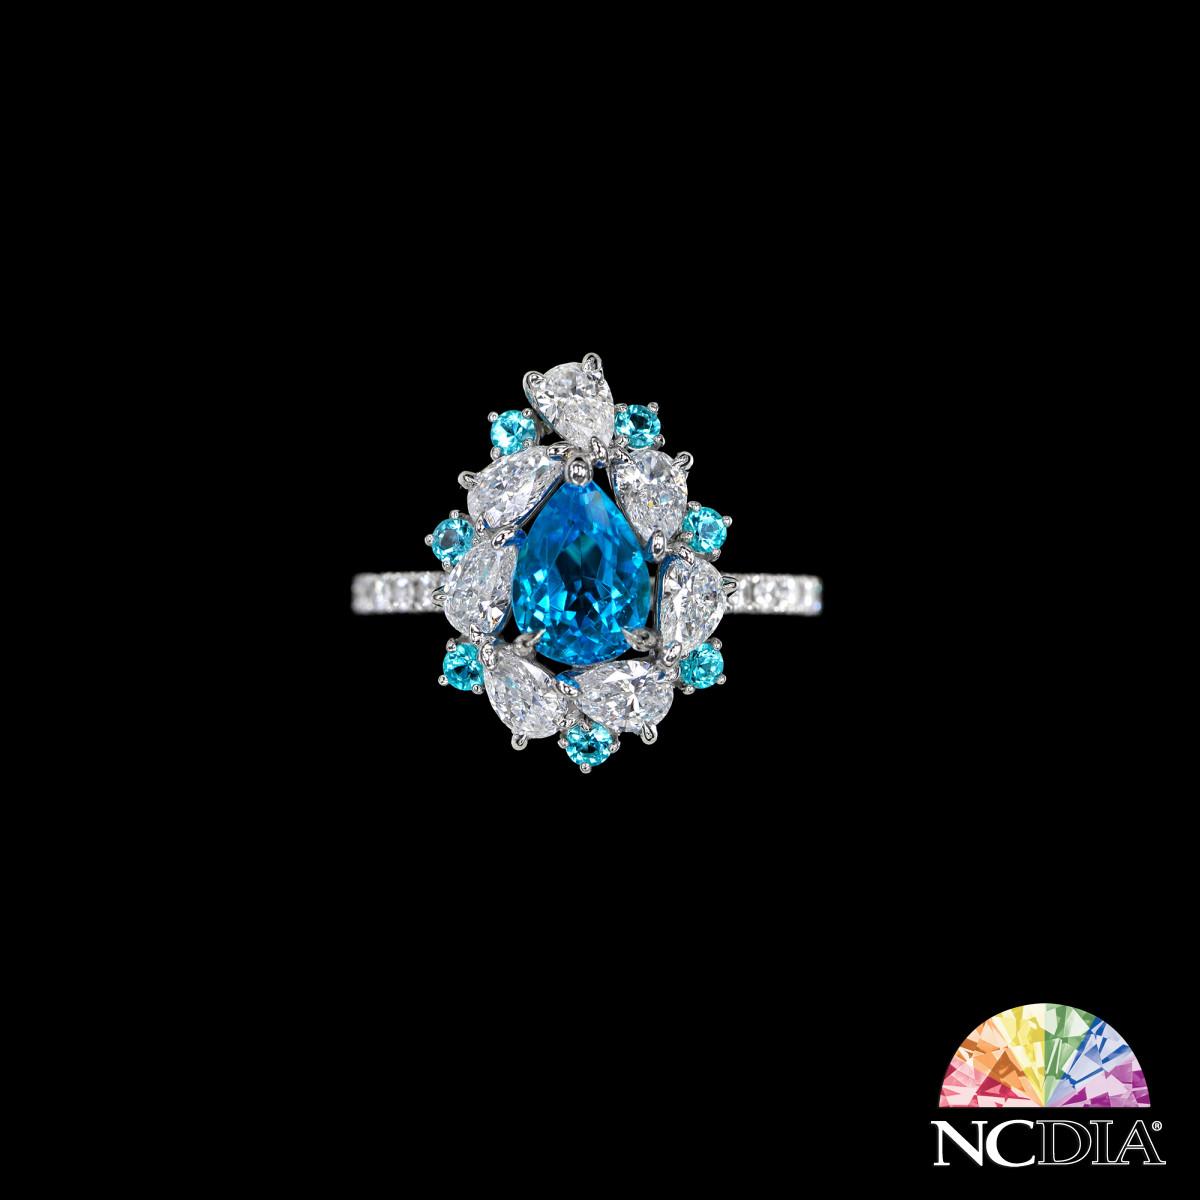 Over 1ct Pear Shape Intensive Greenish Blue Brazilian Paraiba Tourmaline Diamond Ring, AGL cert ava.